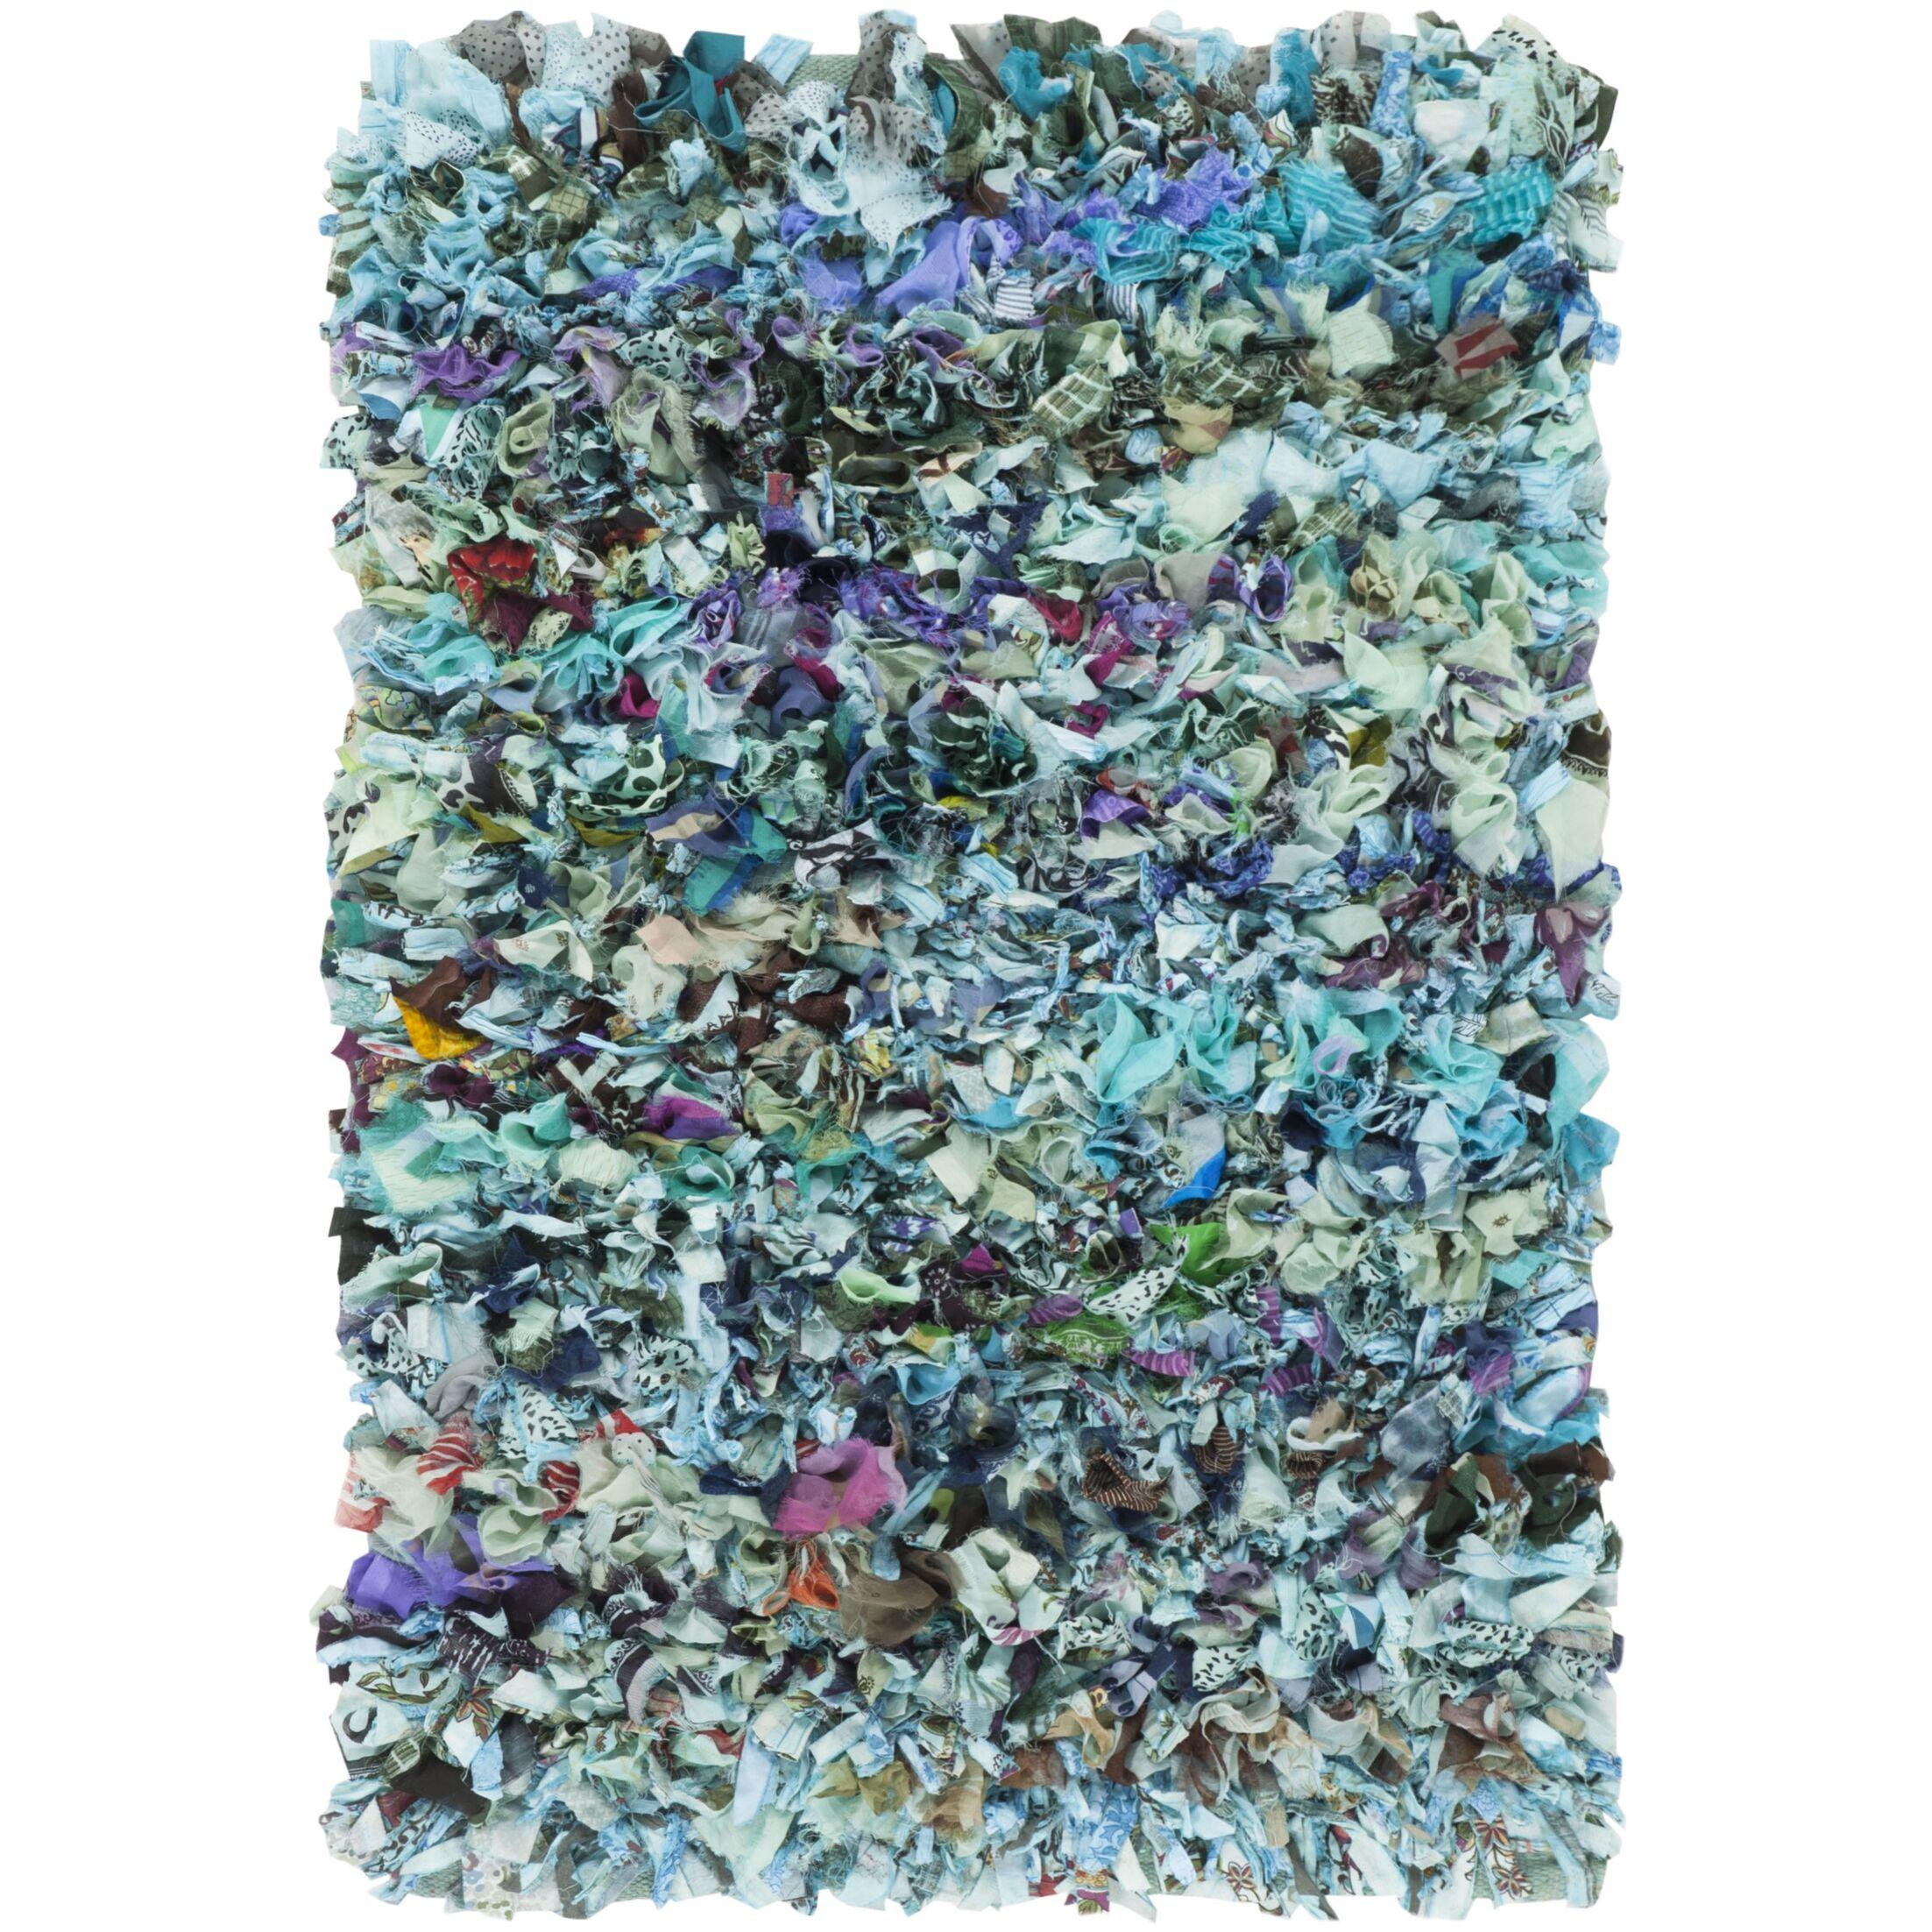 Cudney Shag Hand-Woven Blue Area Rug Rug Size: Rectangle 5' x 8'